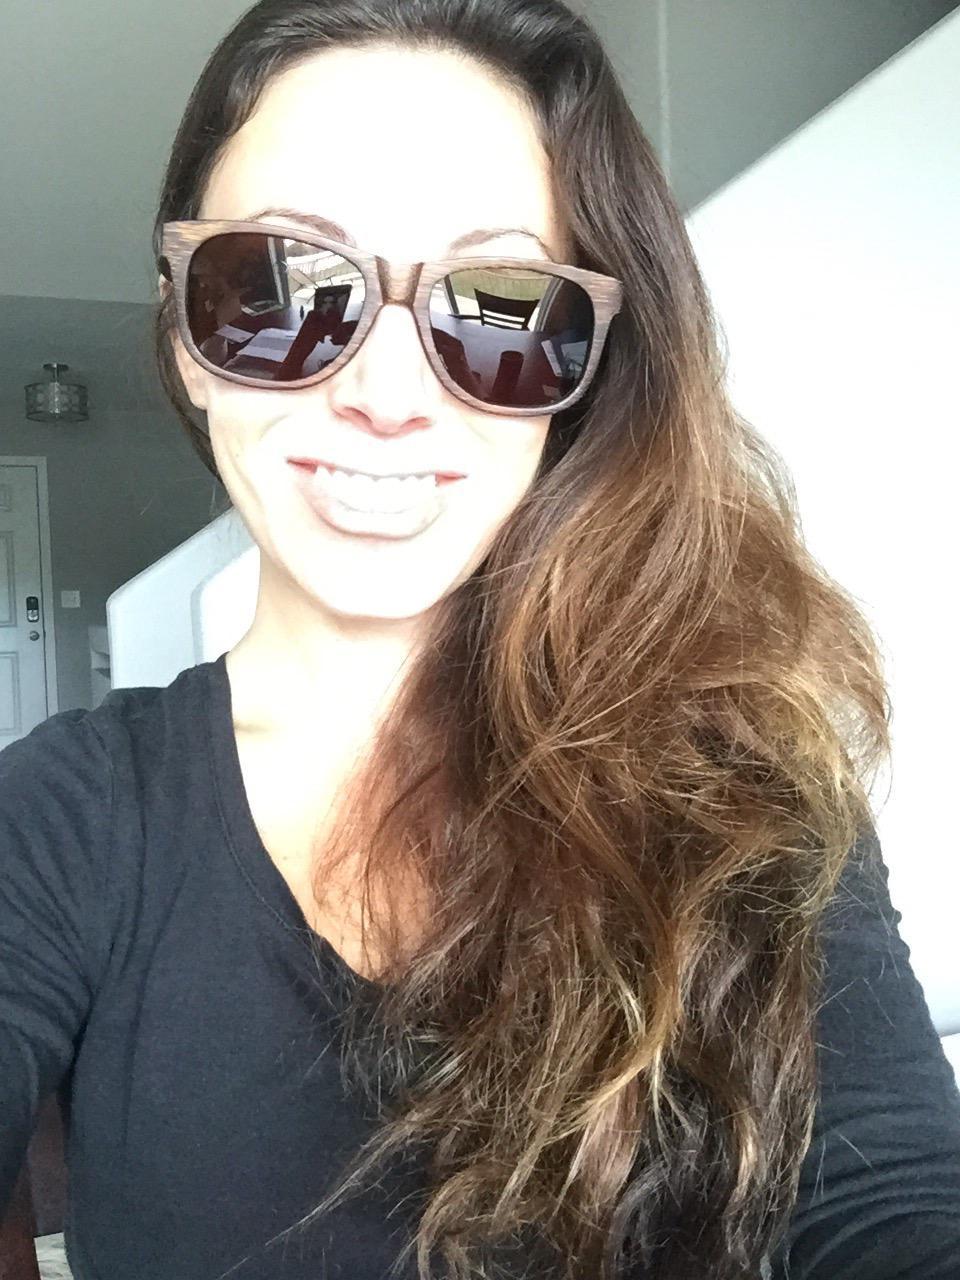 f95beb64d4 Wood Sunglasses Polarized for Men and Women - Bamboo Wooden Wayfarer ...